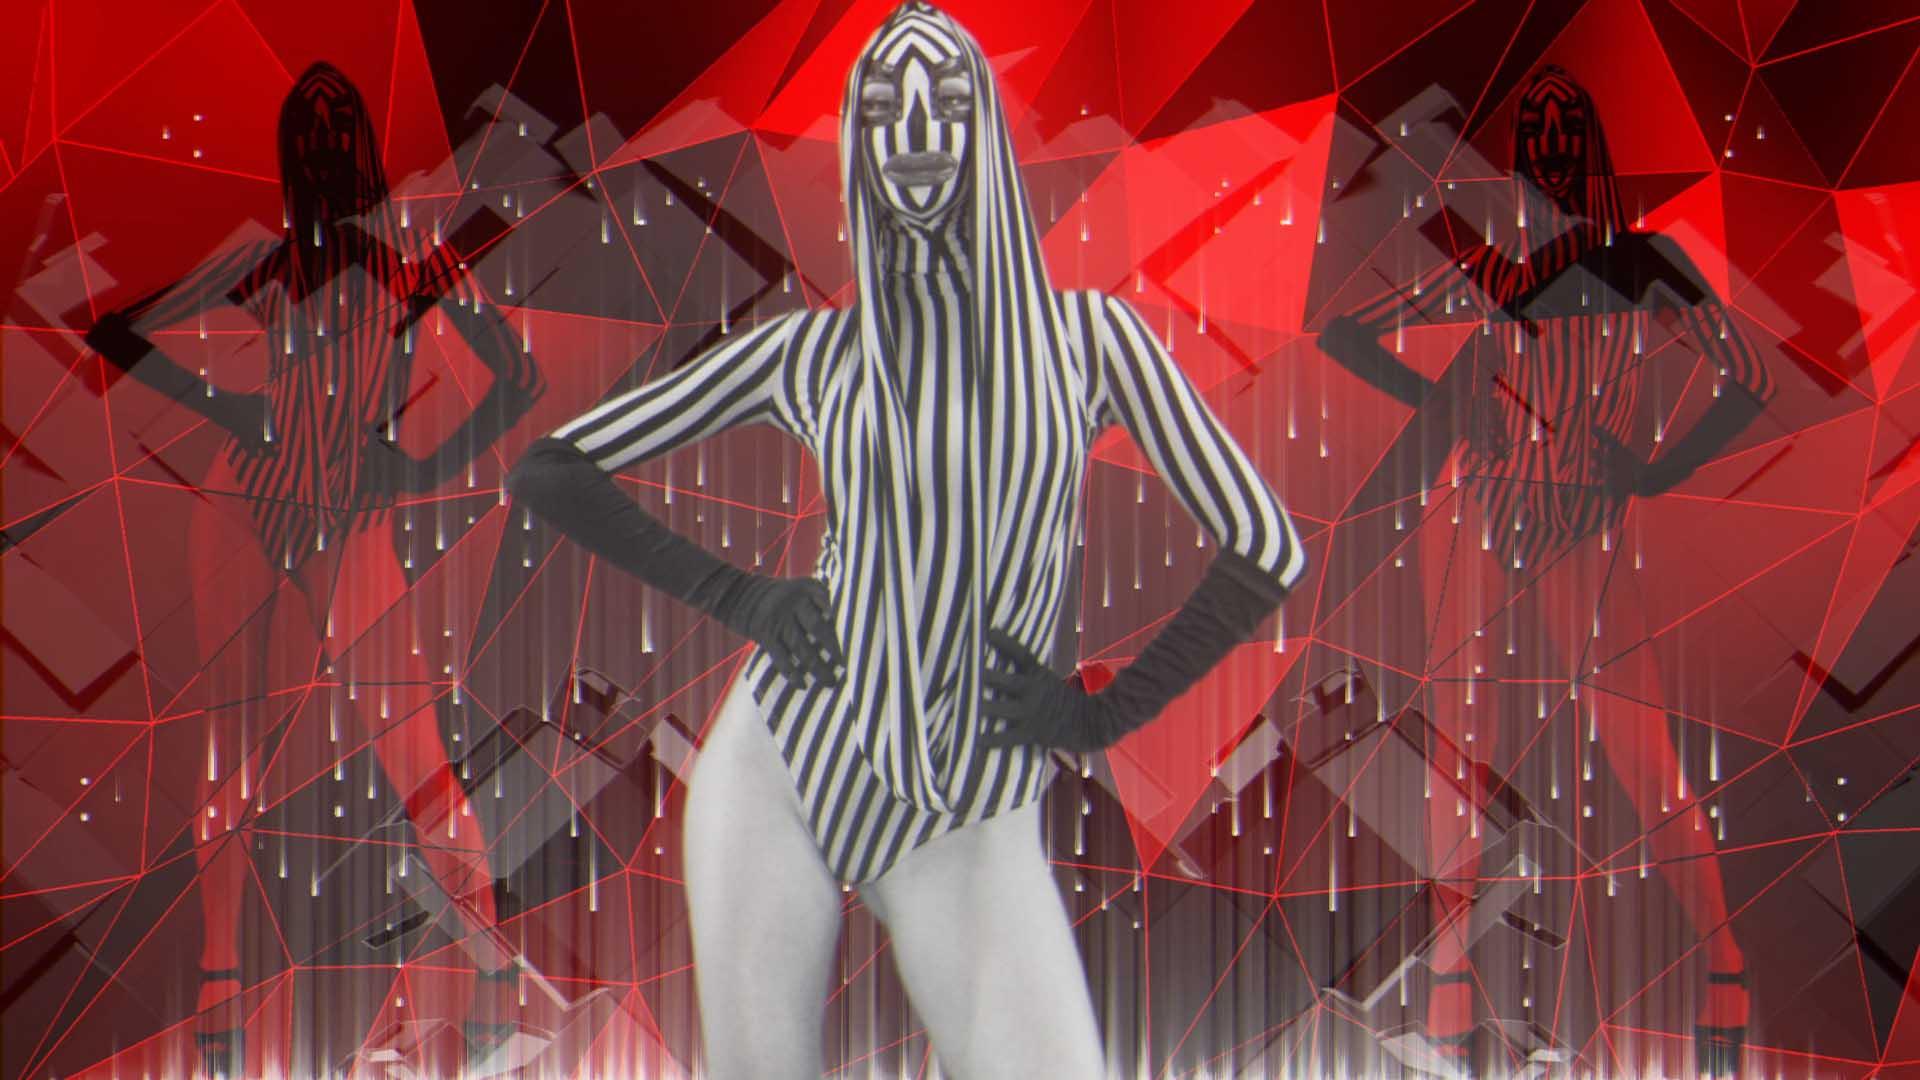 Go Go Girl Abstract Video Loop Vj